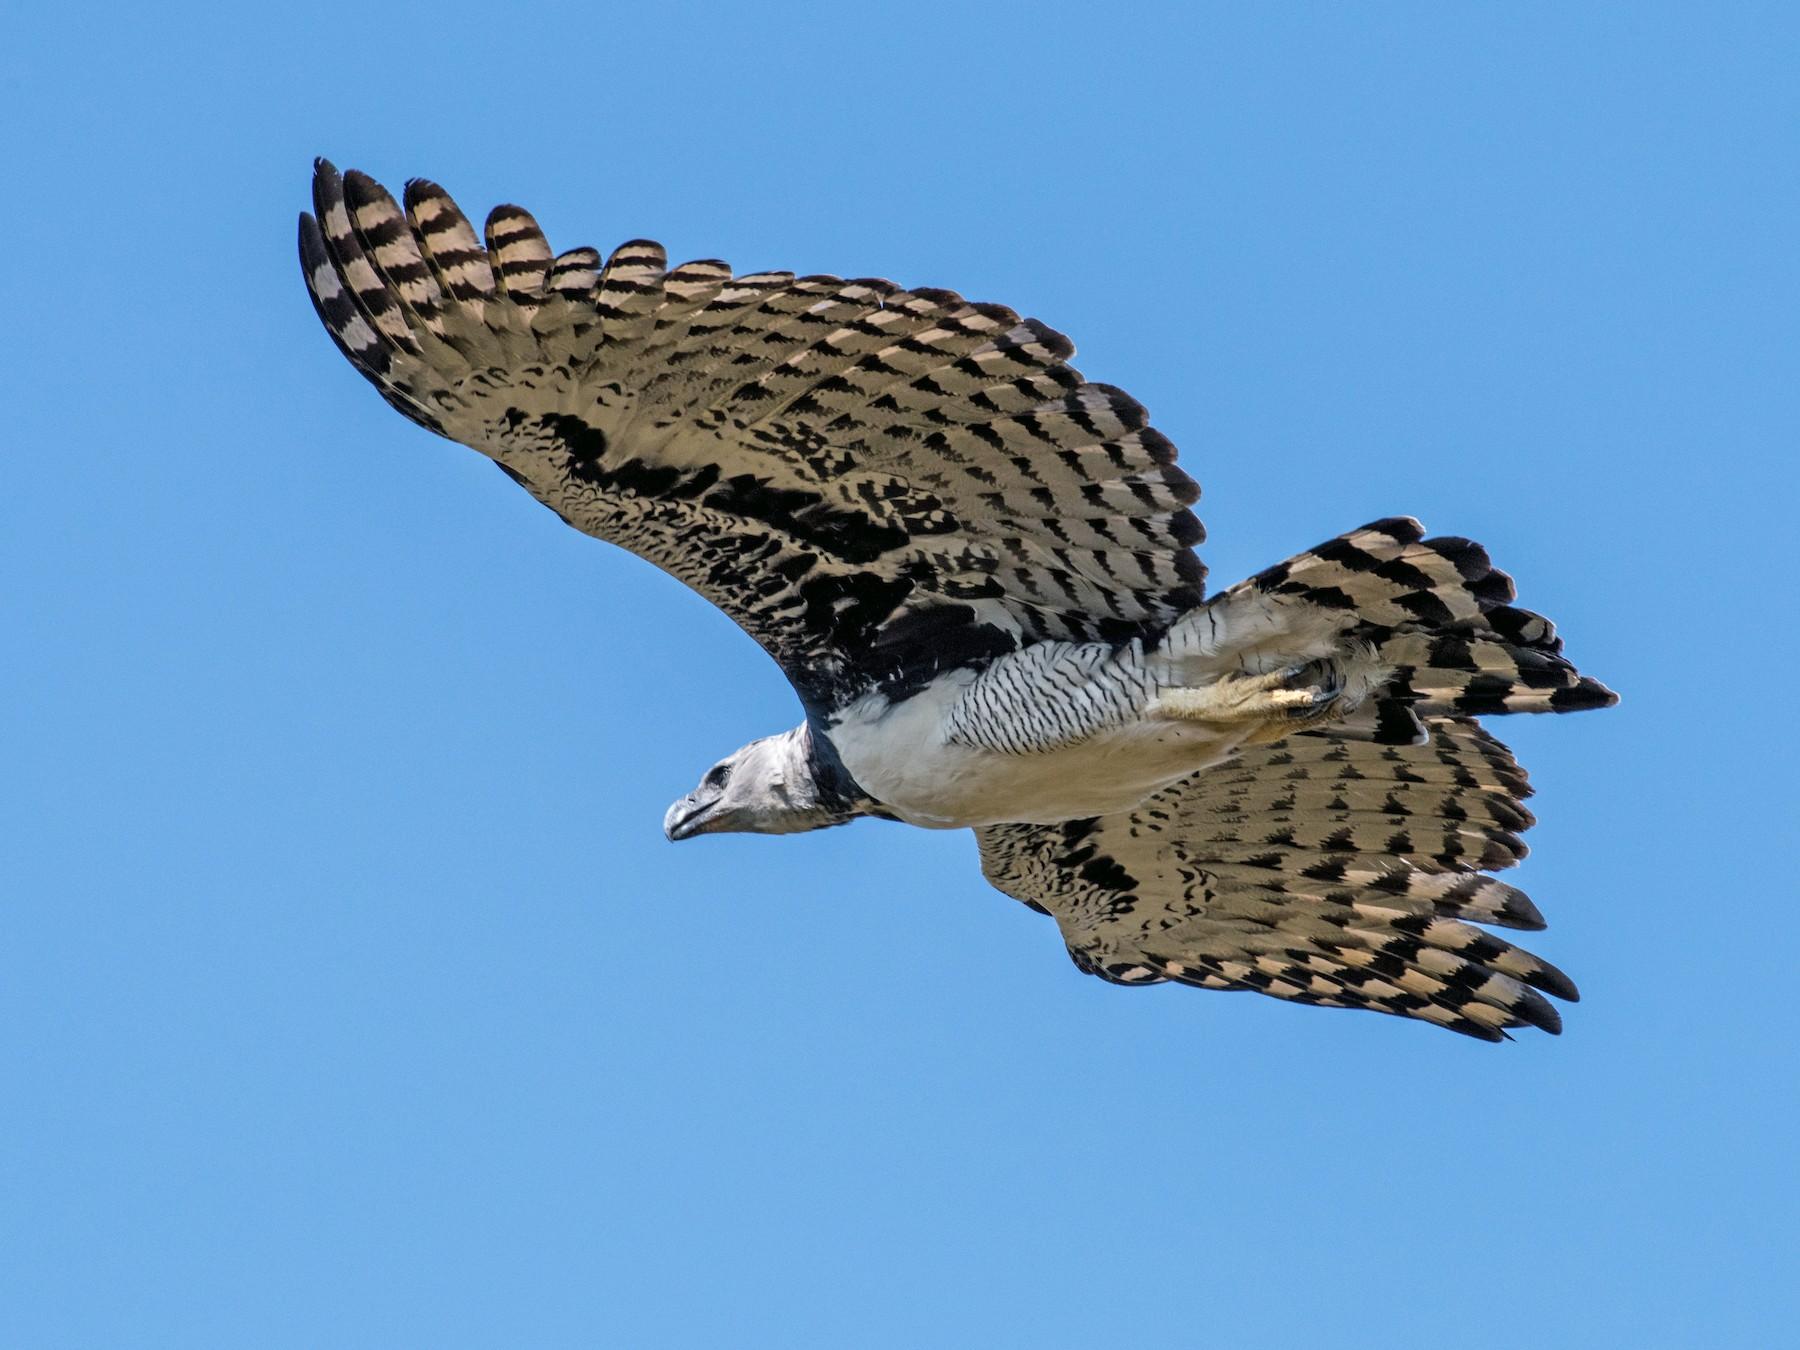 Harpy Eagle - Hank Davis